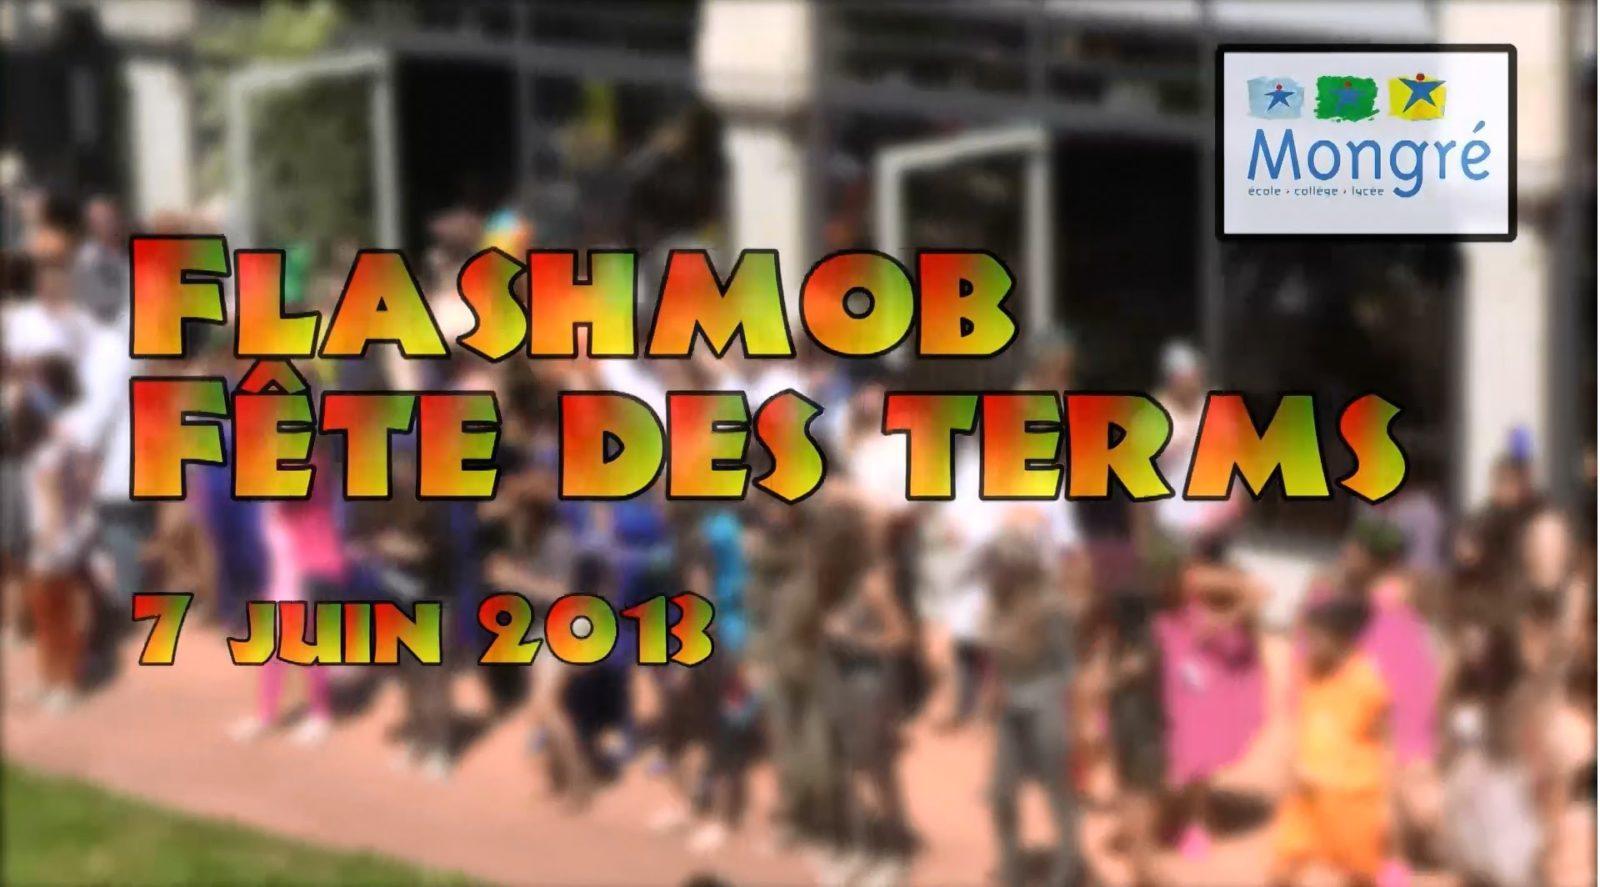 Flashmob des terminales de Montgré